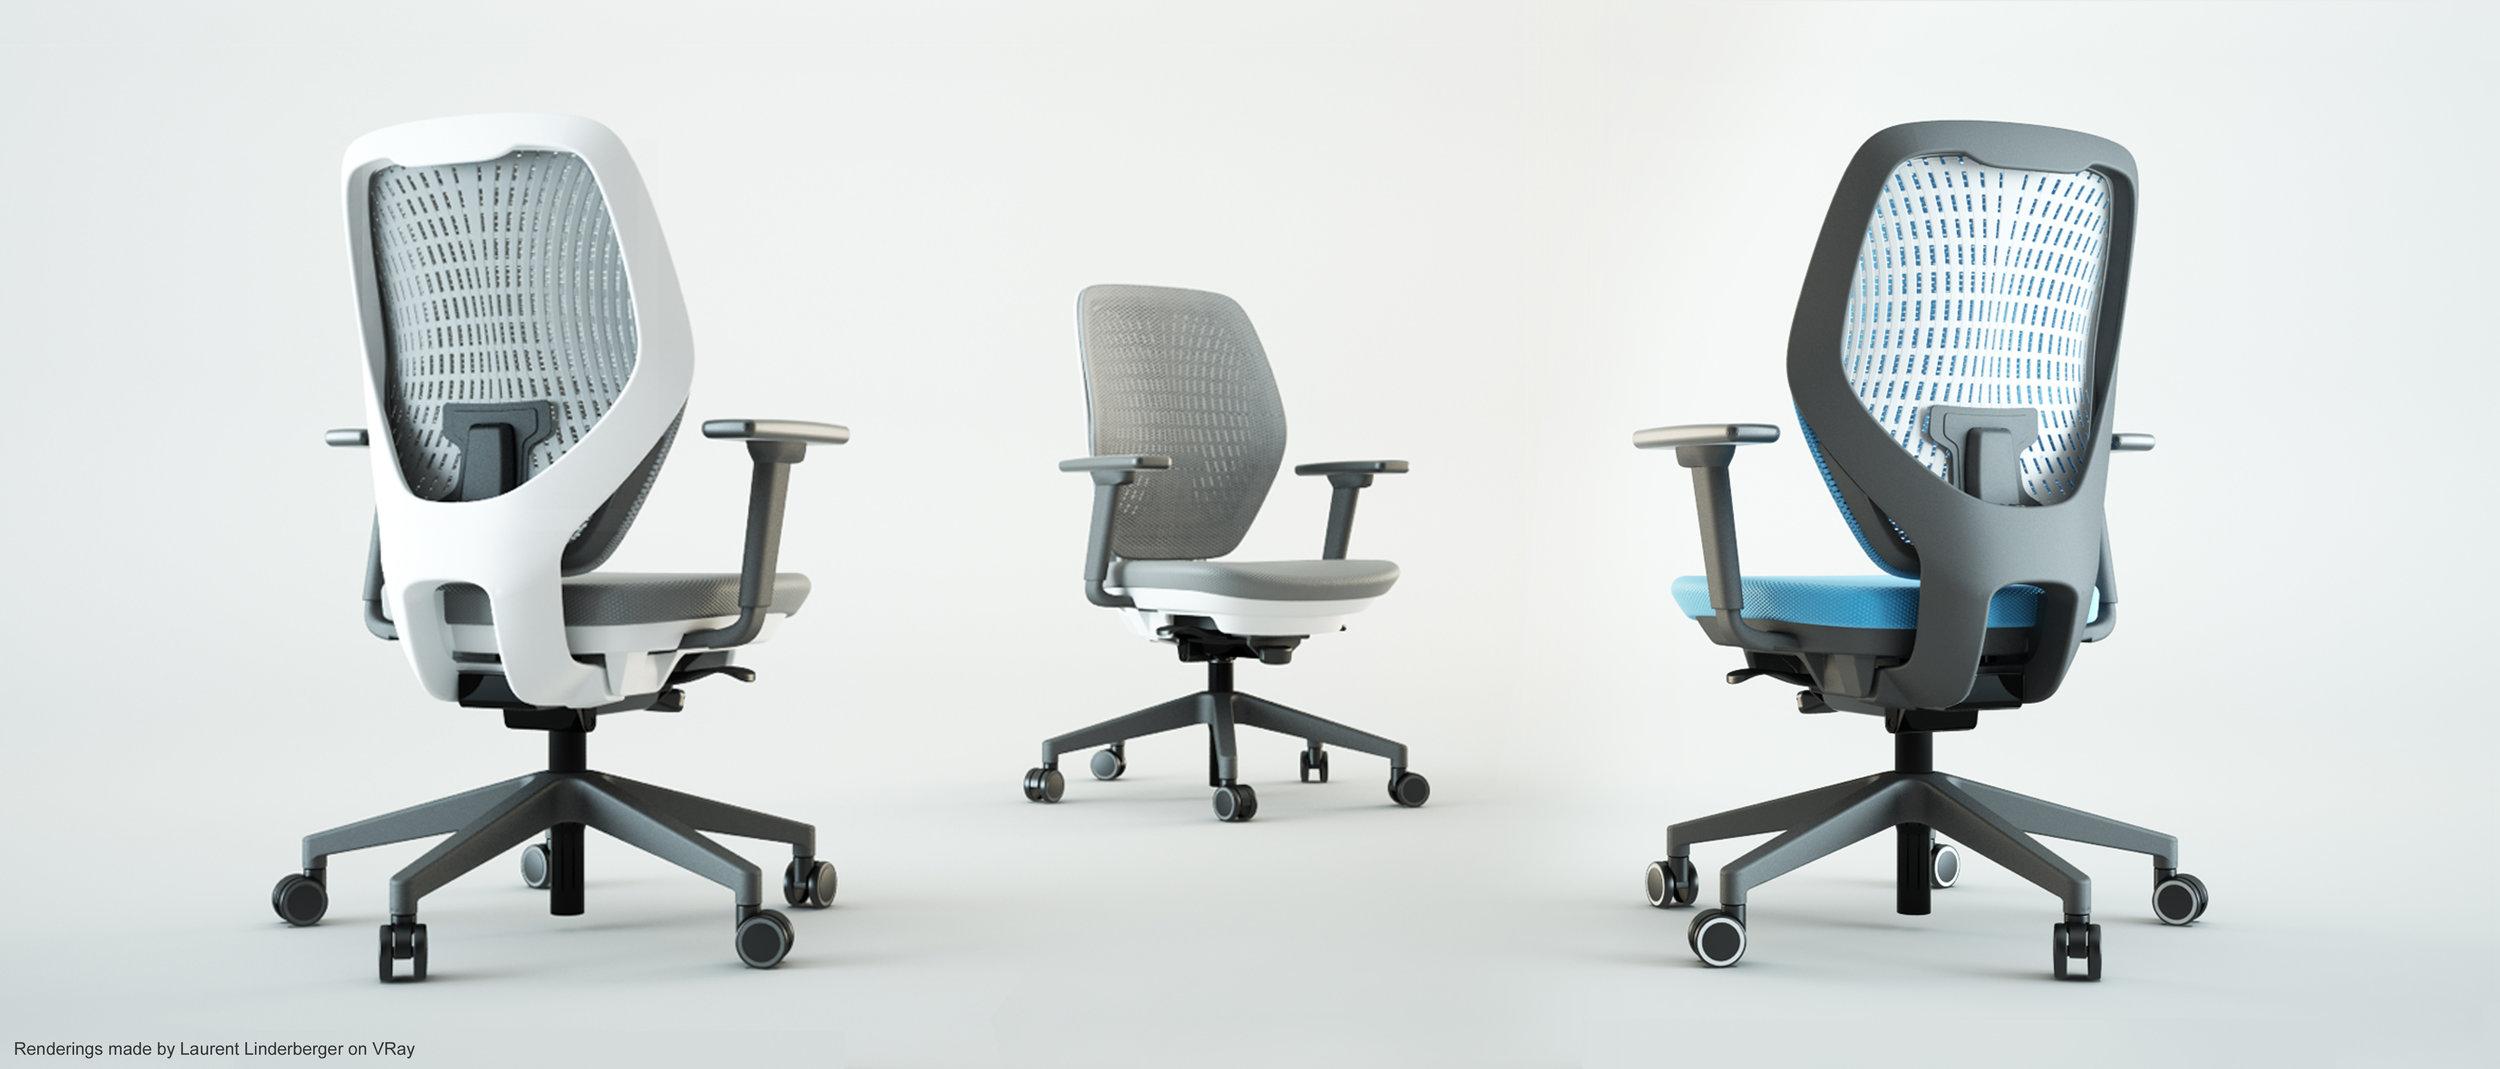 00E_DarioNarvaez_Portfolio_Ingo_Chair_Covers_WEB-1.jpg